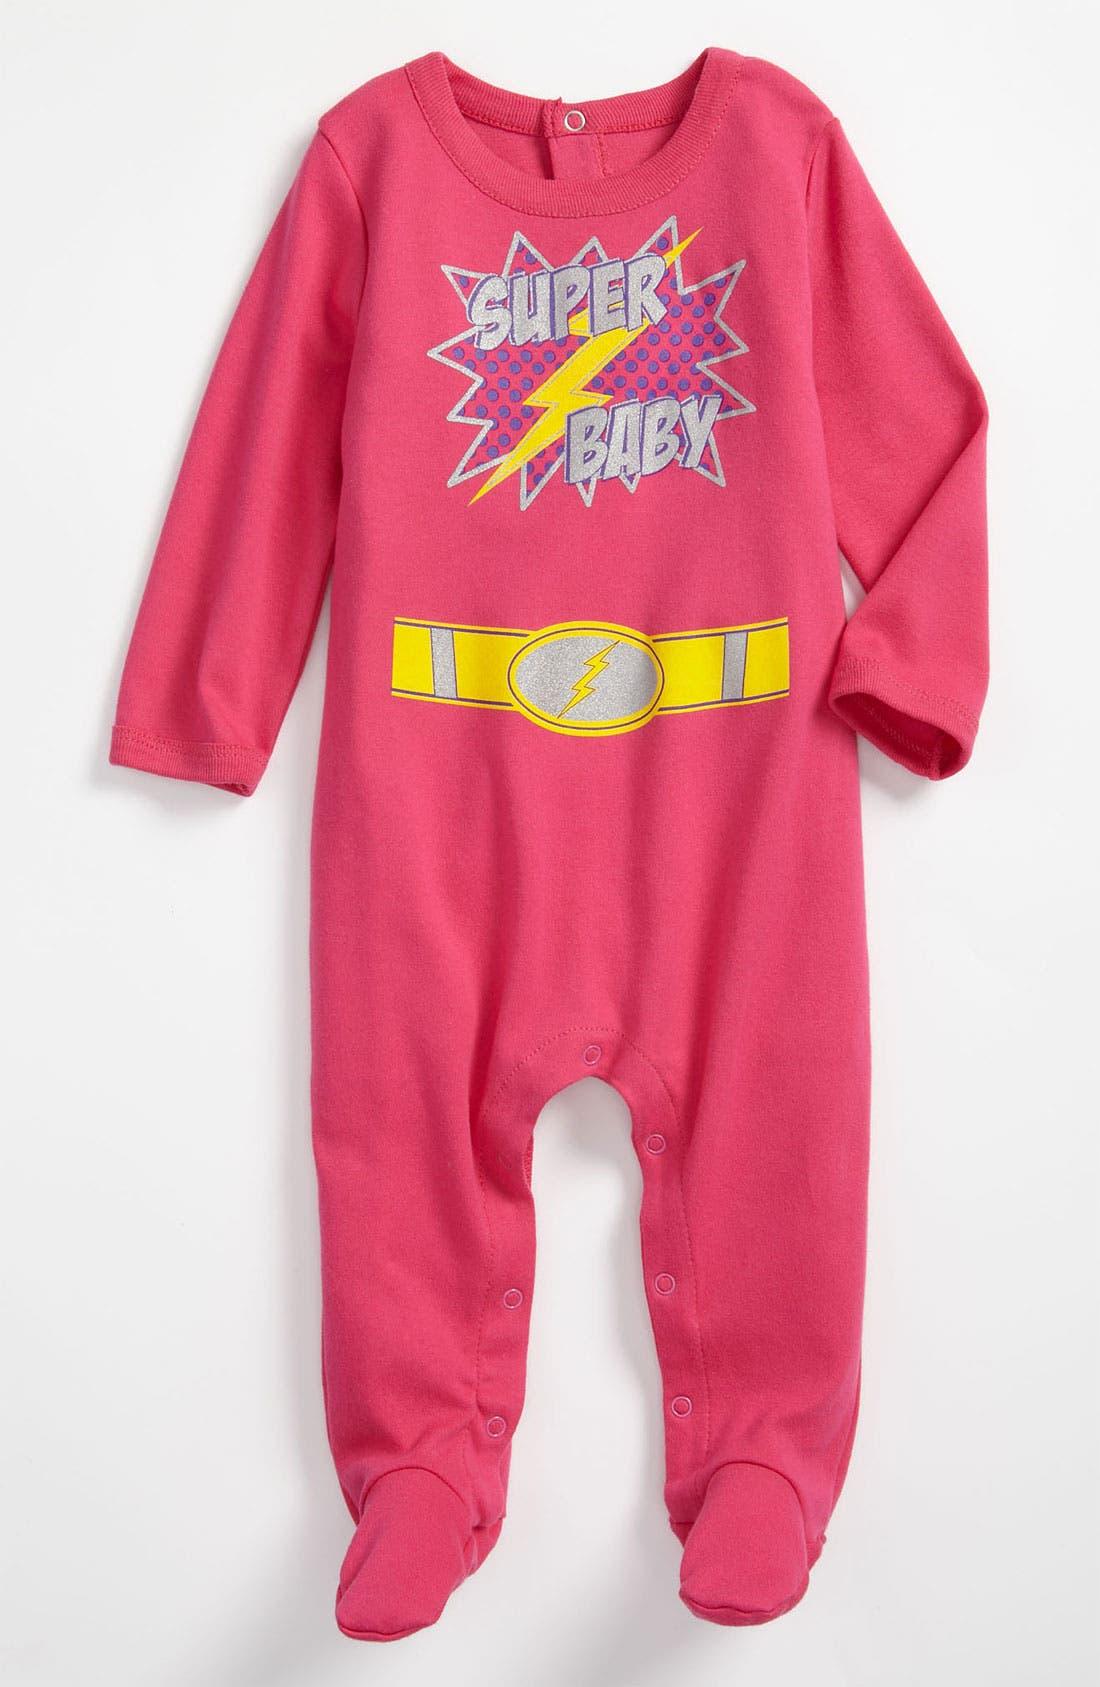 Alternate Image 1 Selected - Sara Kety Baby & Kids 'Super Baby' Footie (Infant)